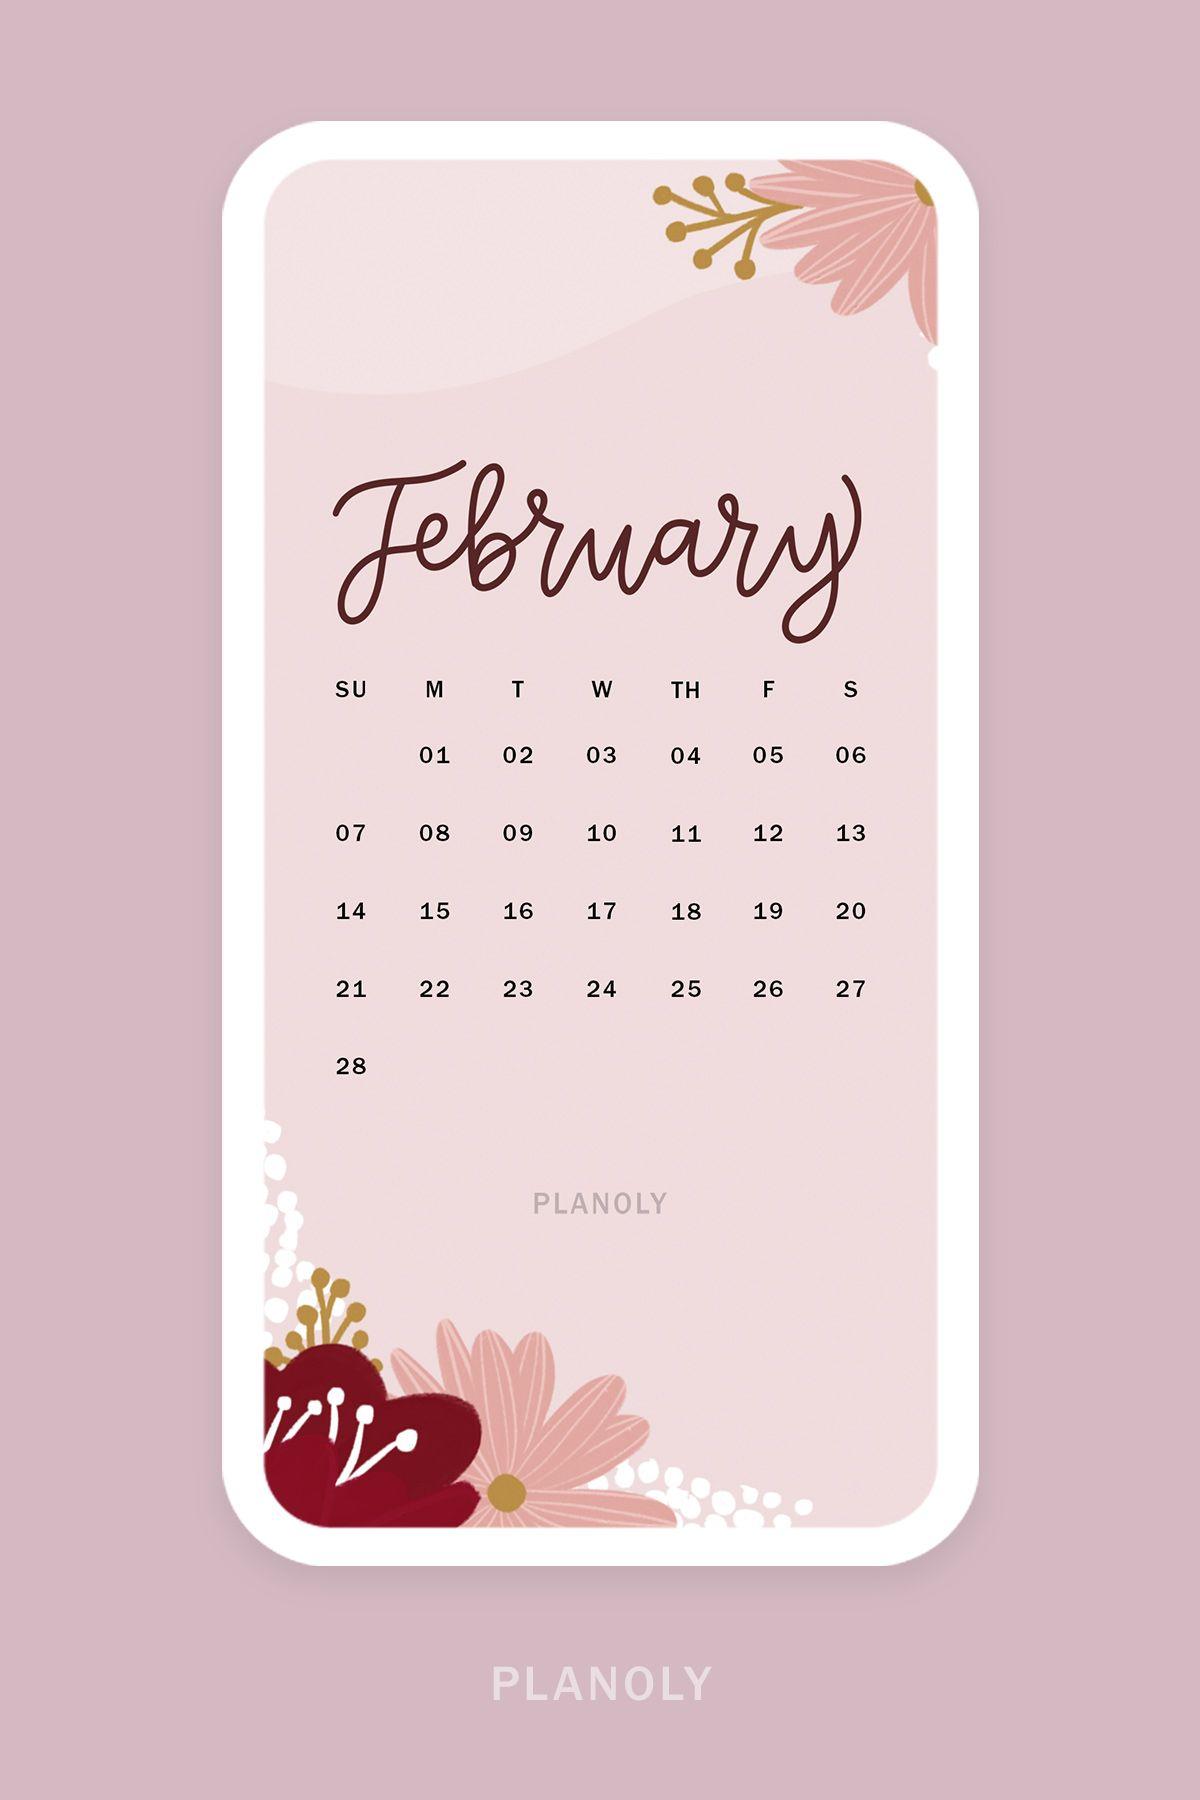 PLANOLY-Blog Post-Q1 Content Calendars-Image 5